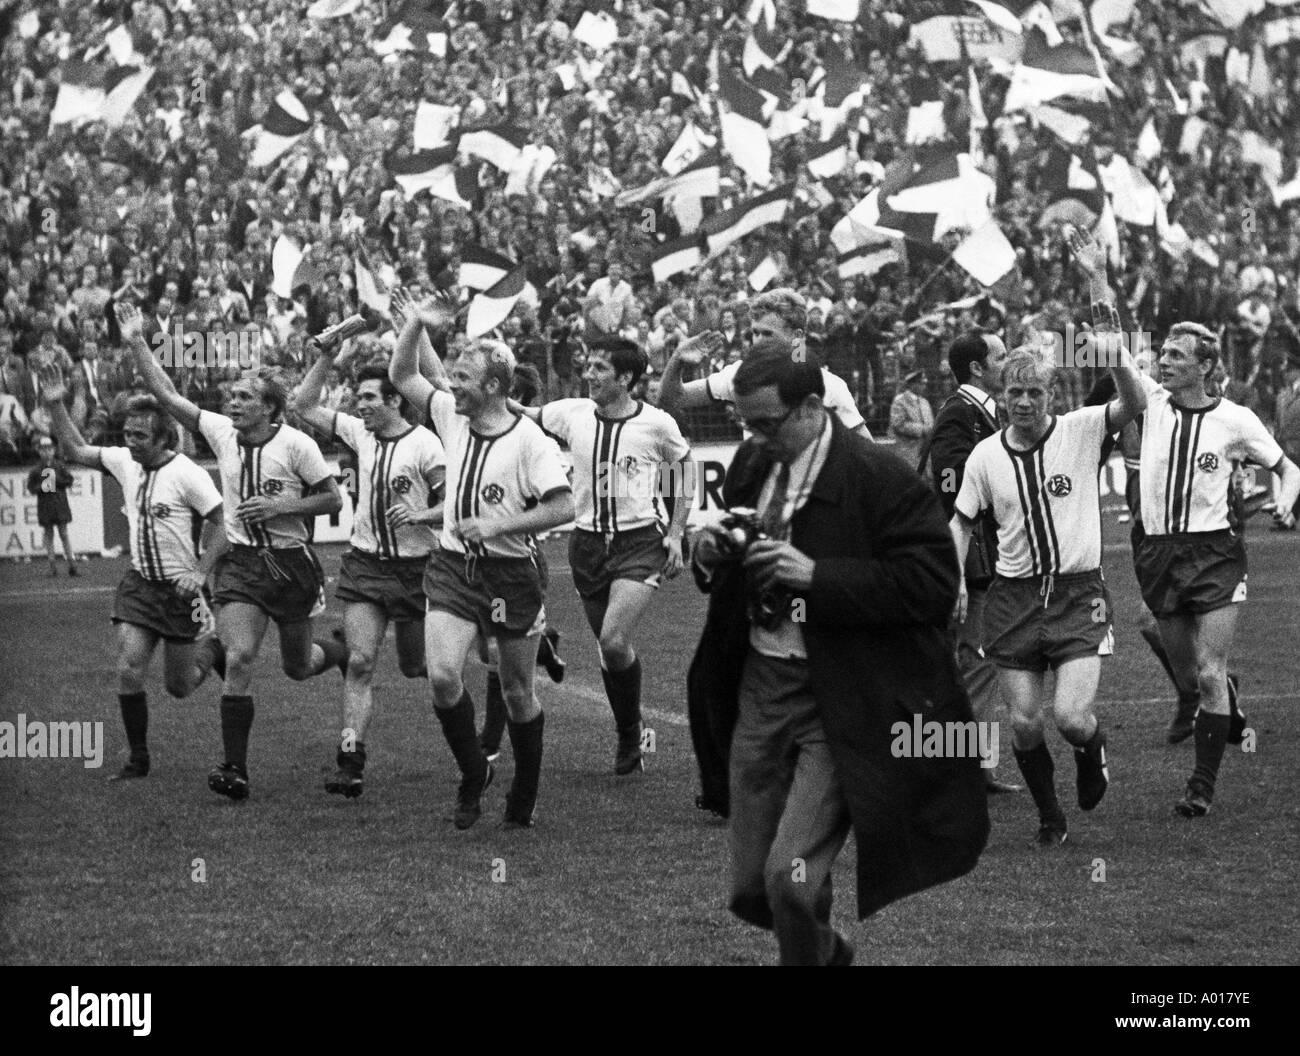 football, Regionalliga, 1968/1969, promotion match to the Bundesliga, 1969/1970, Rot-Weiss Essen versus VfL Osnabrueck Stock Photo